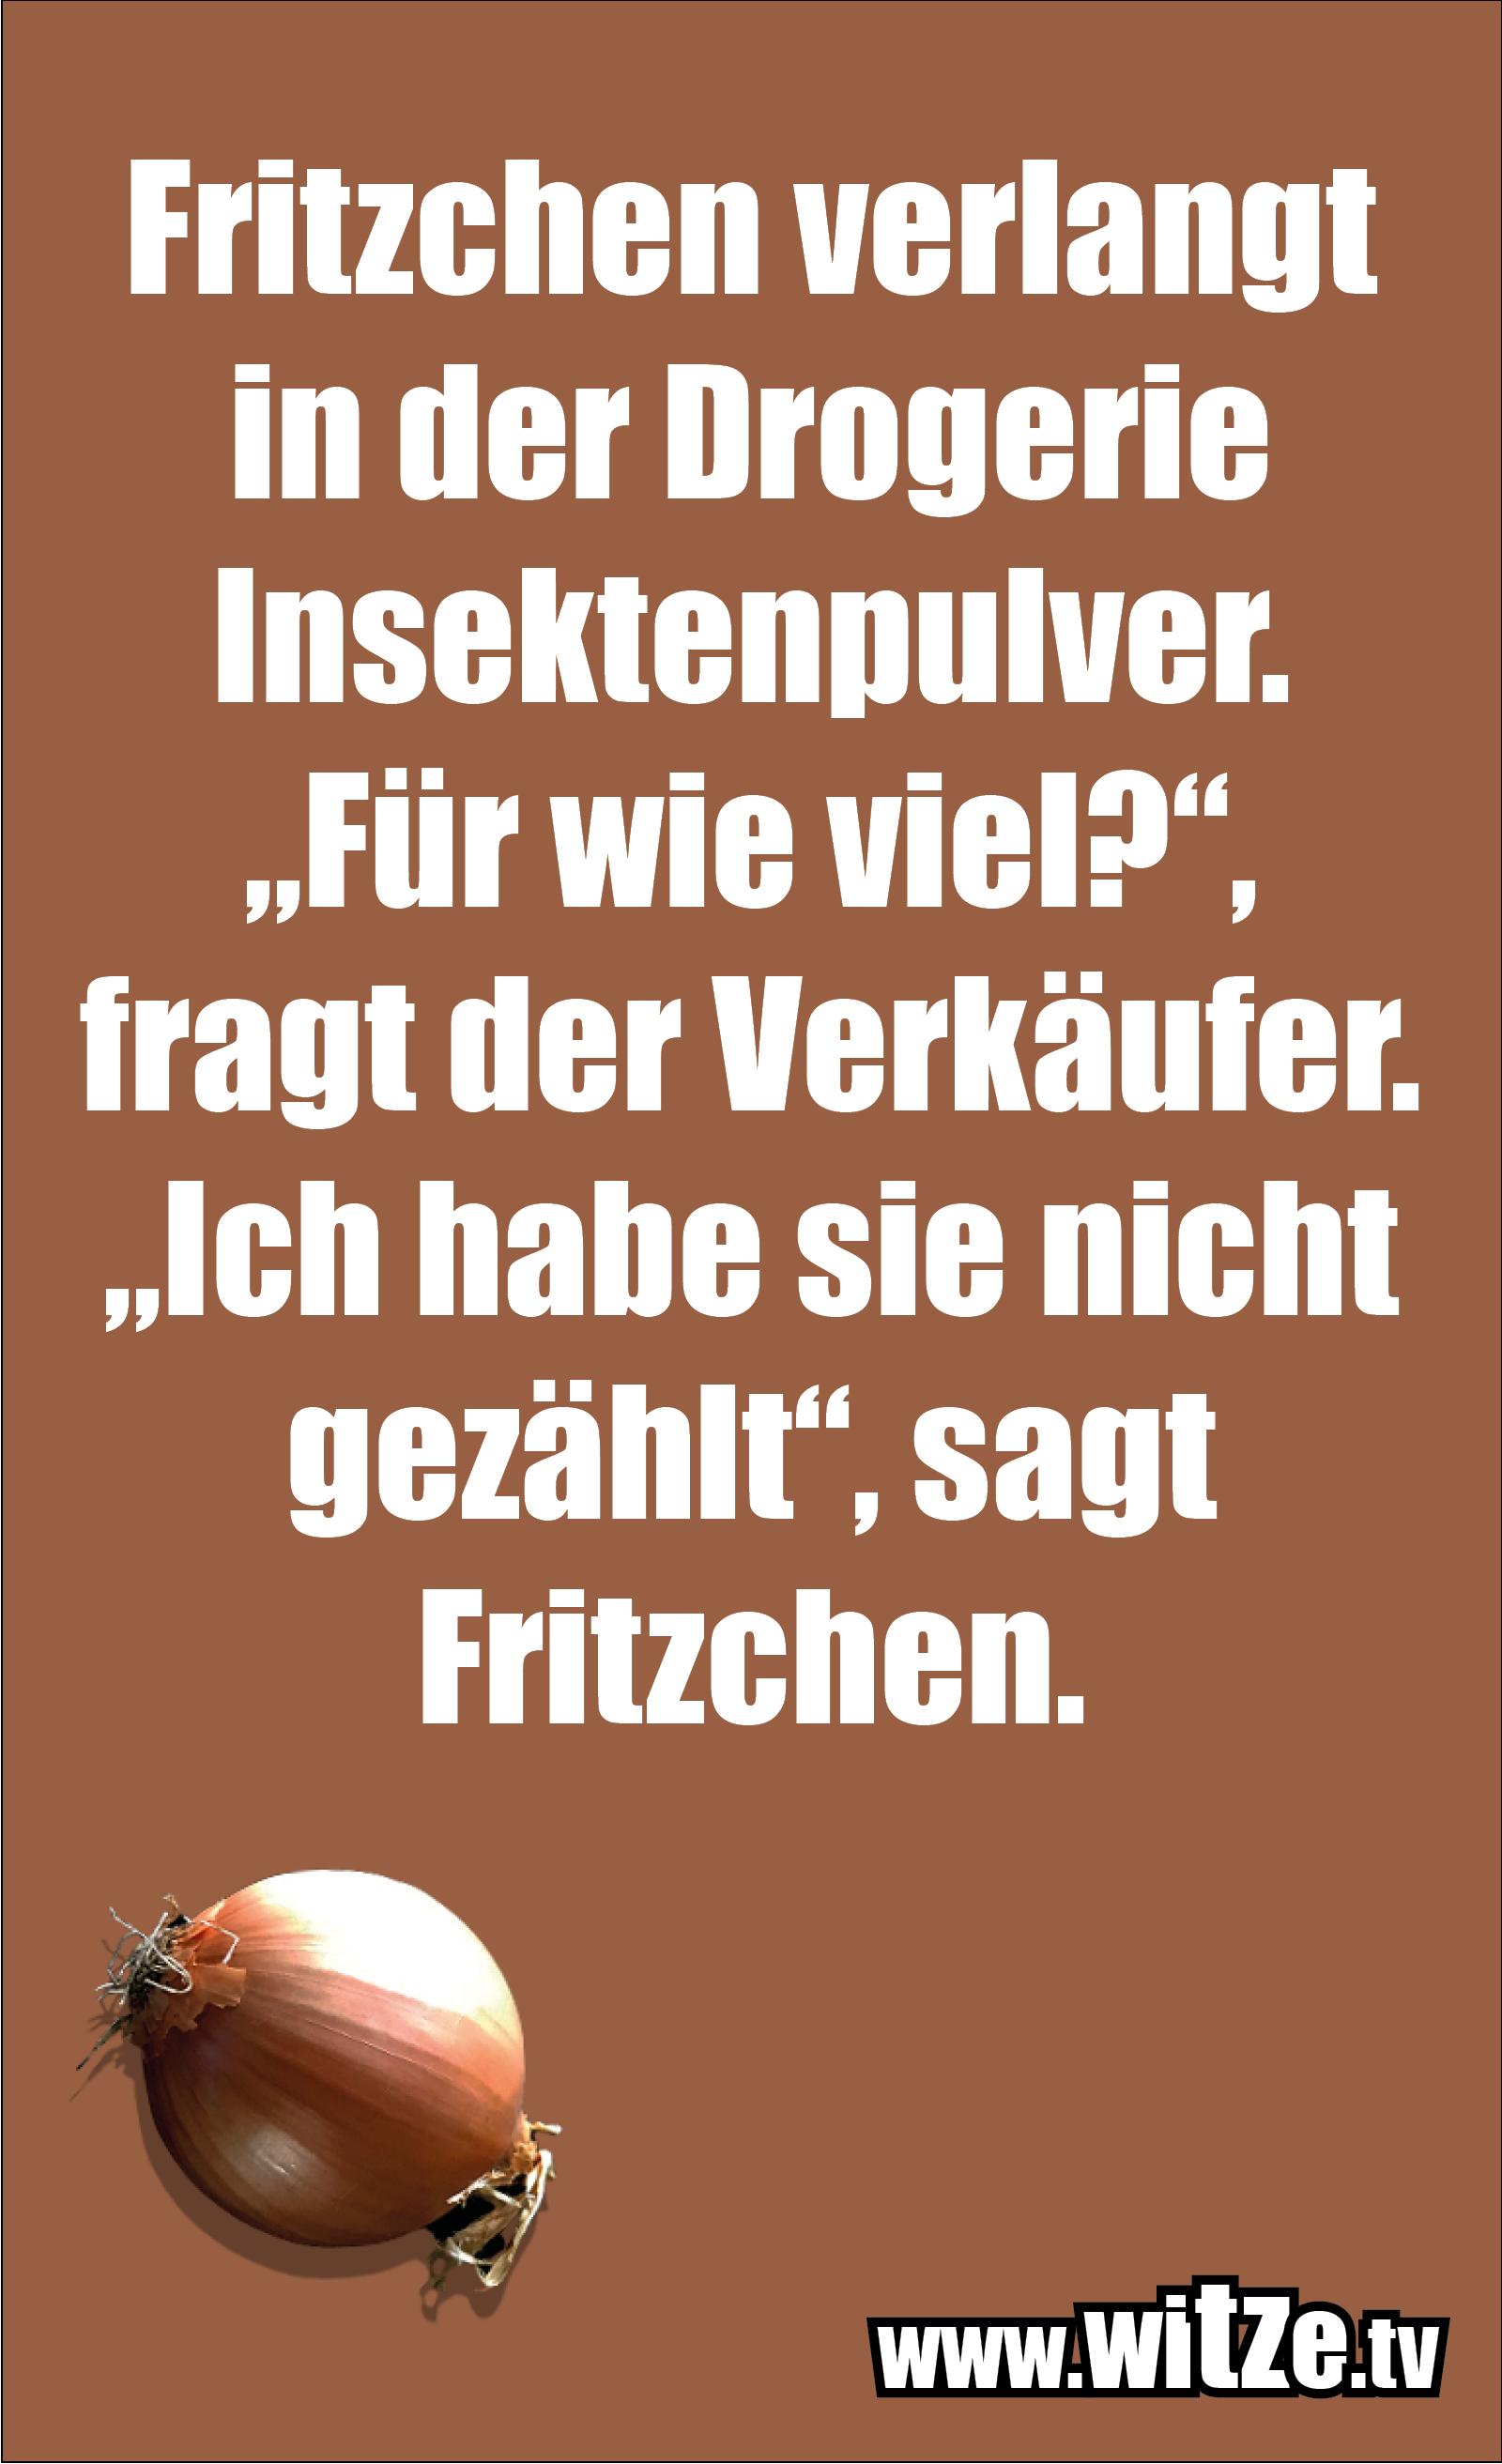 Hammer Gag... Fritzchen verlangt in der Drogerie...